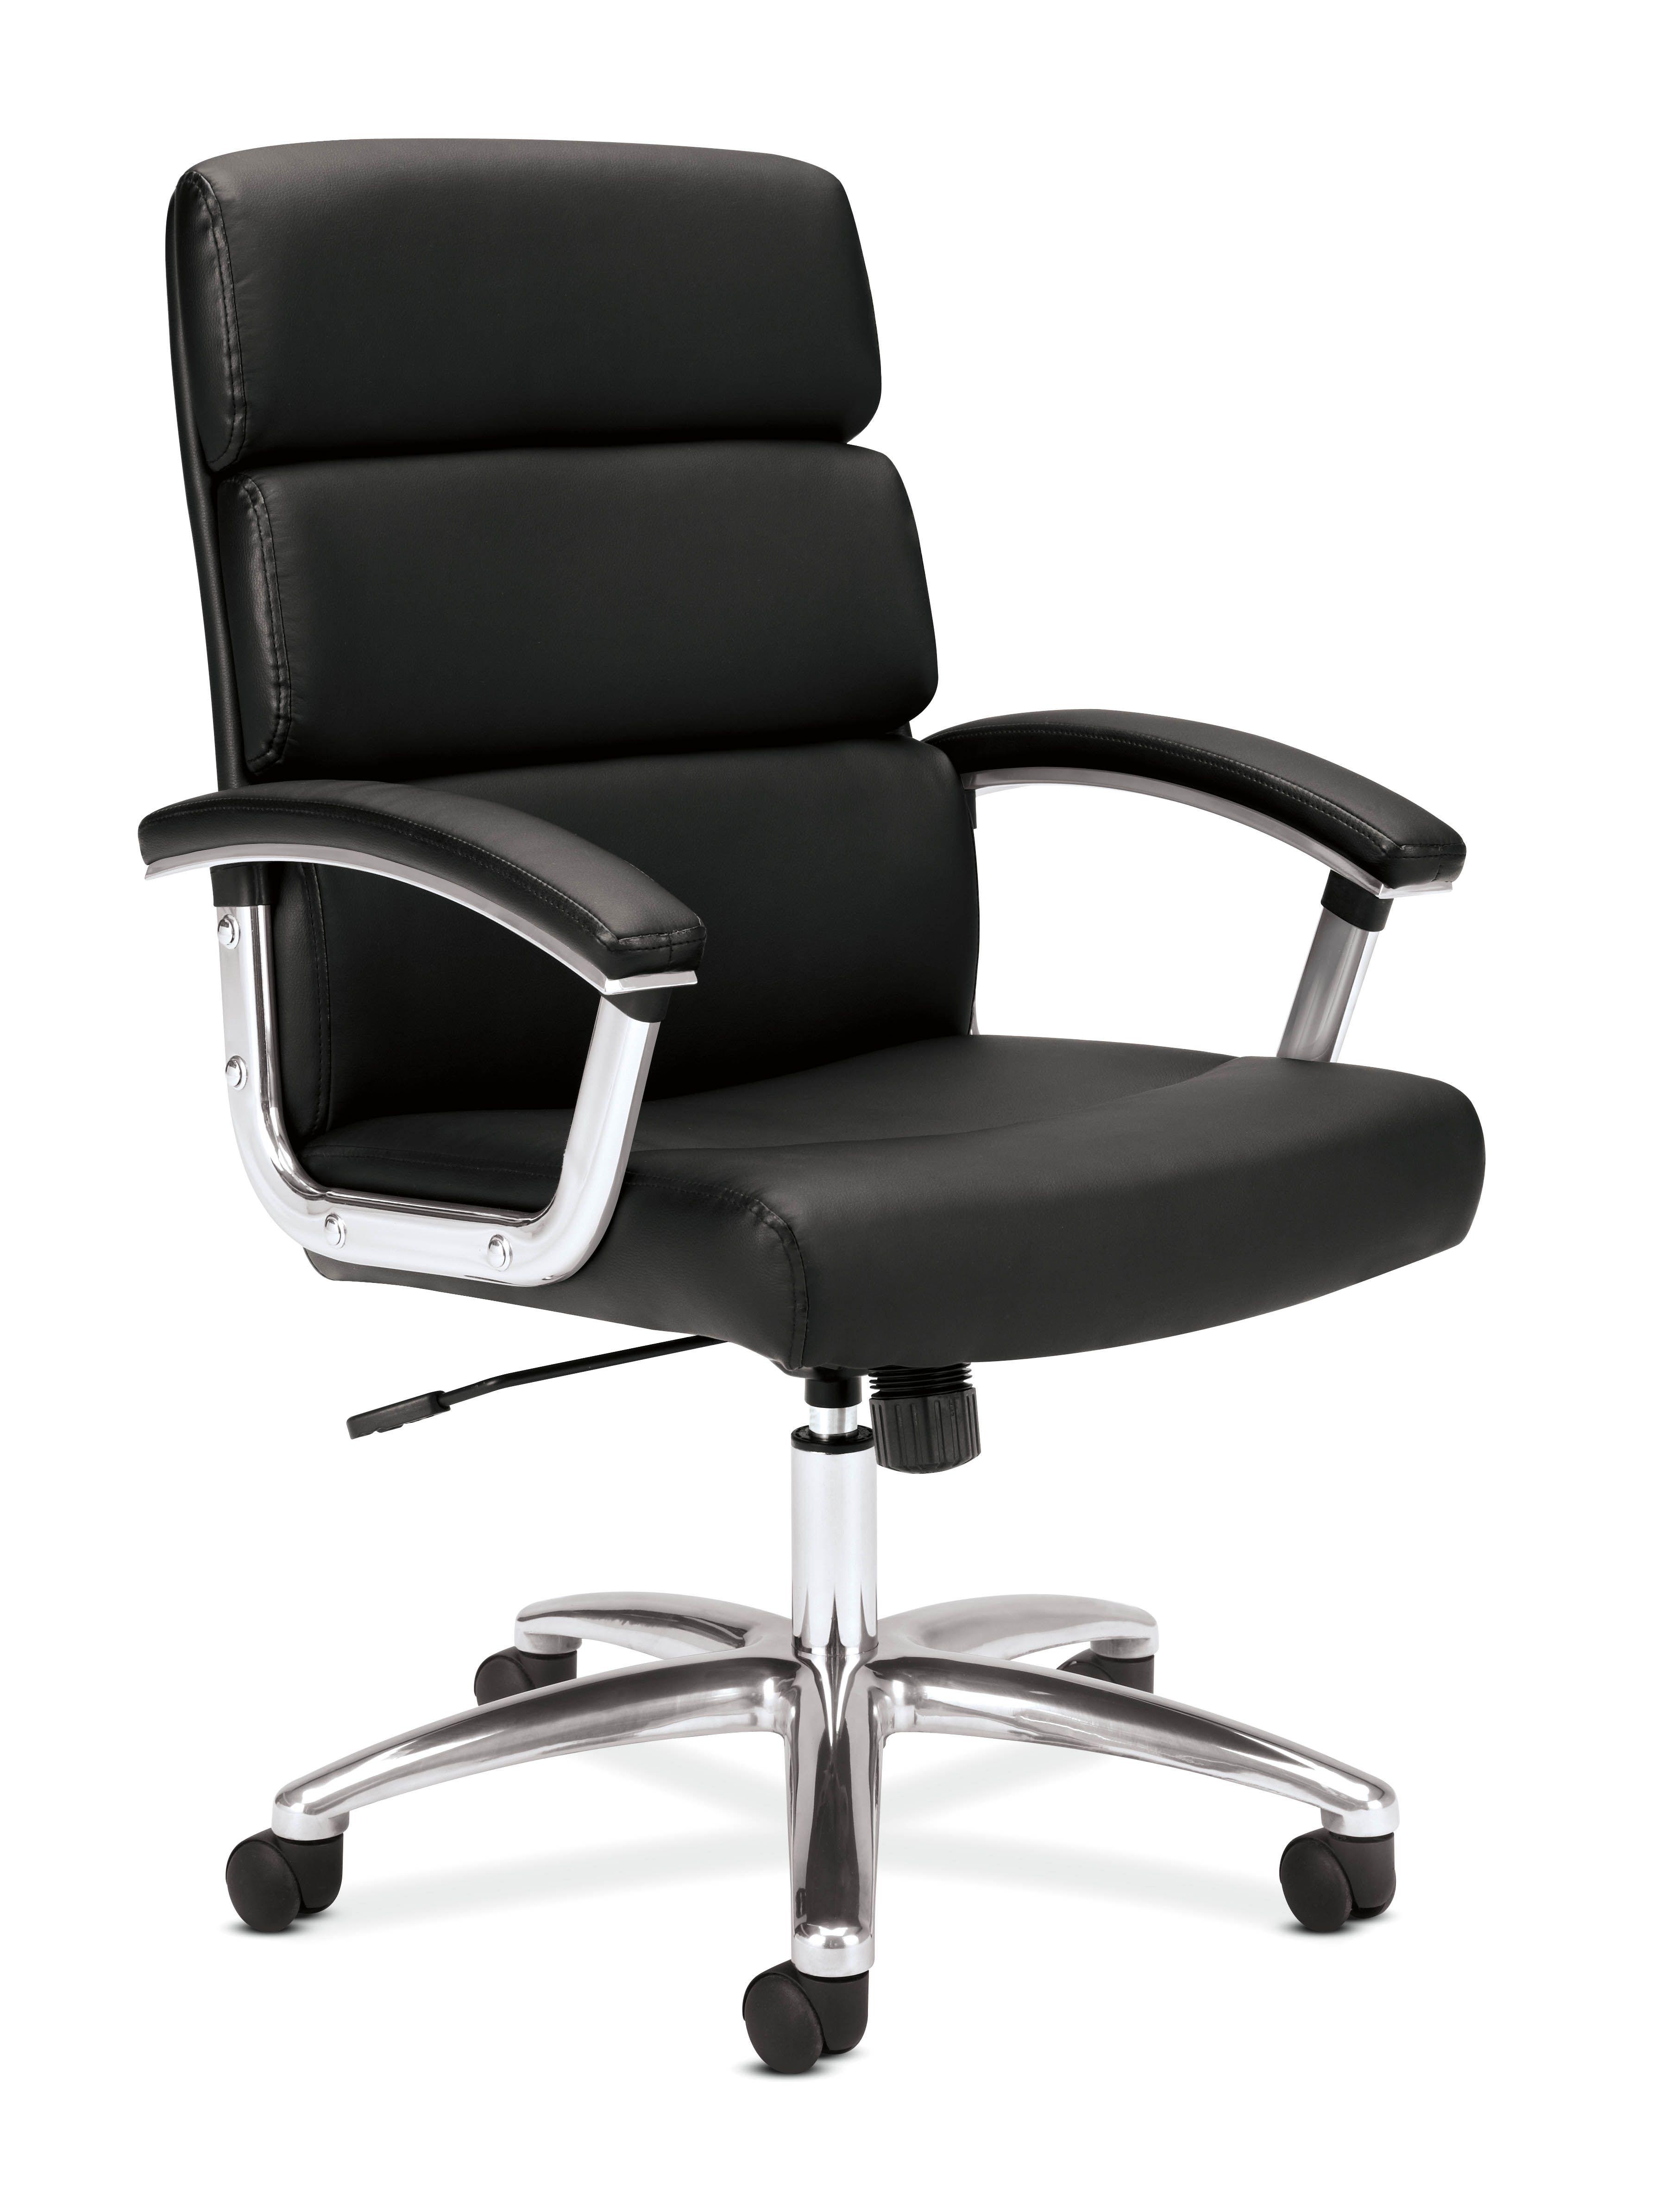 basyx by HON VL103 HighBack Chair Item BSXVL103SB11